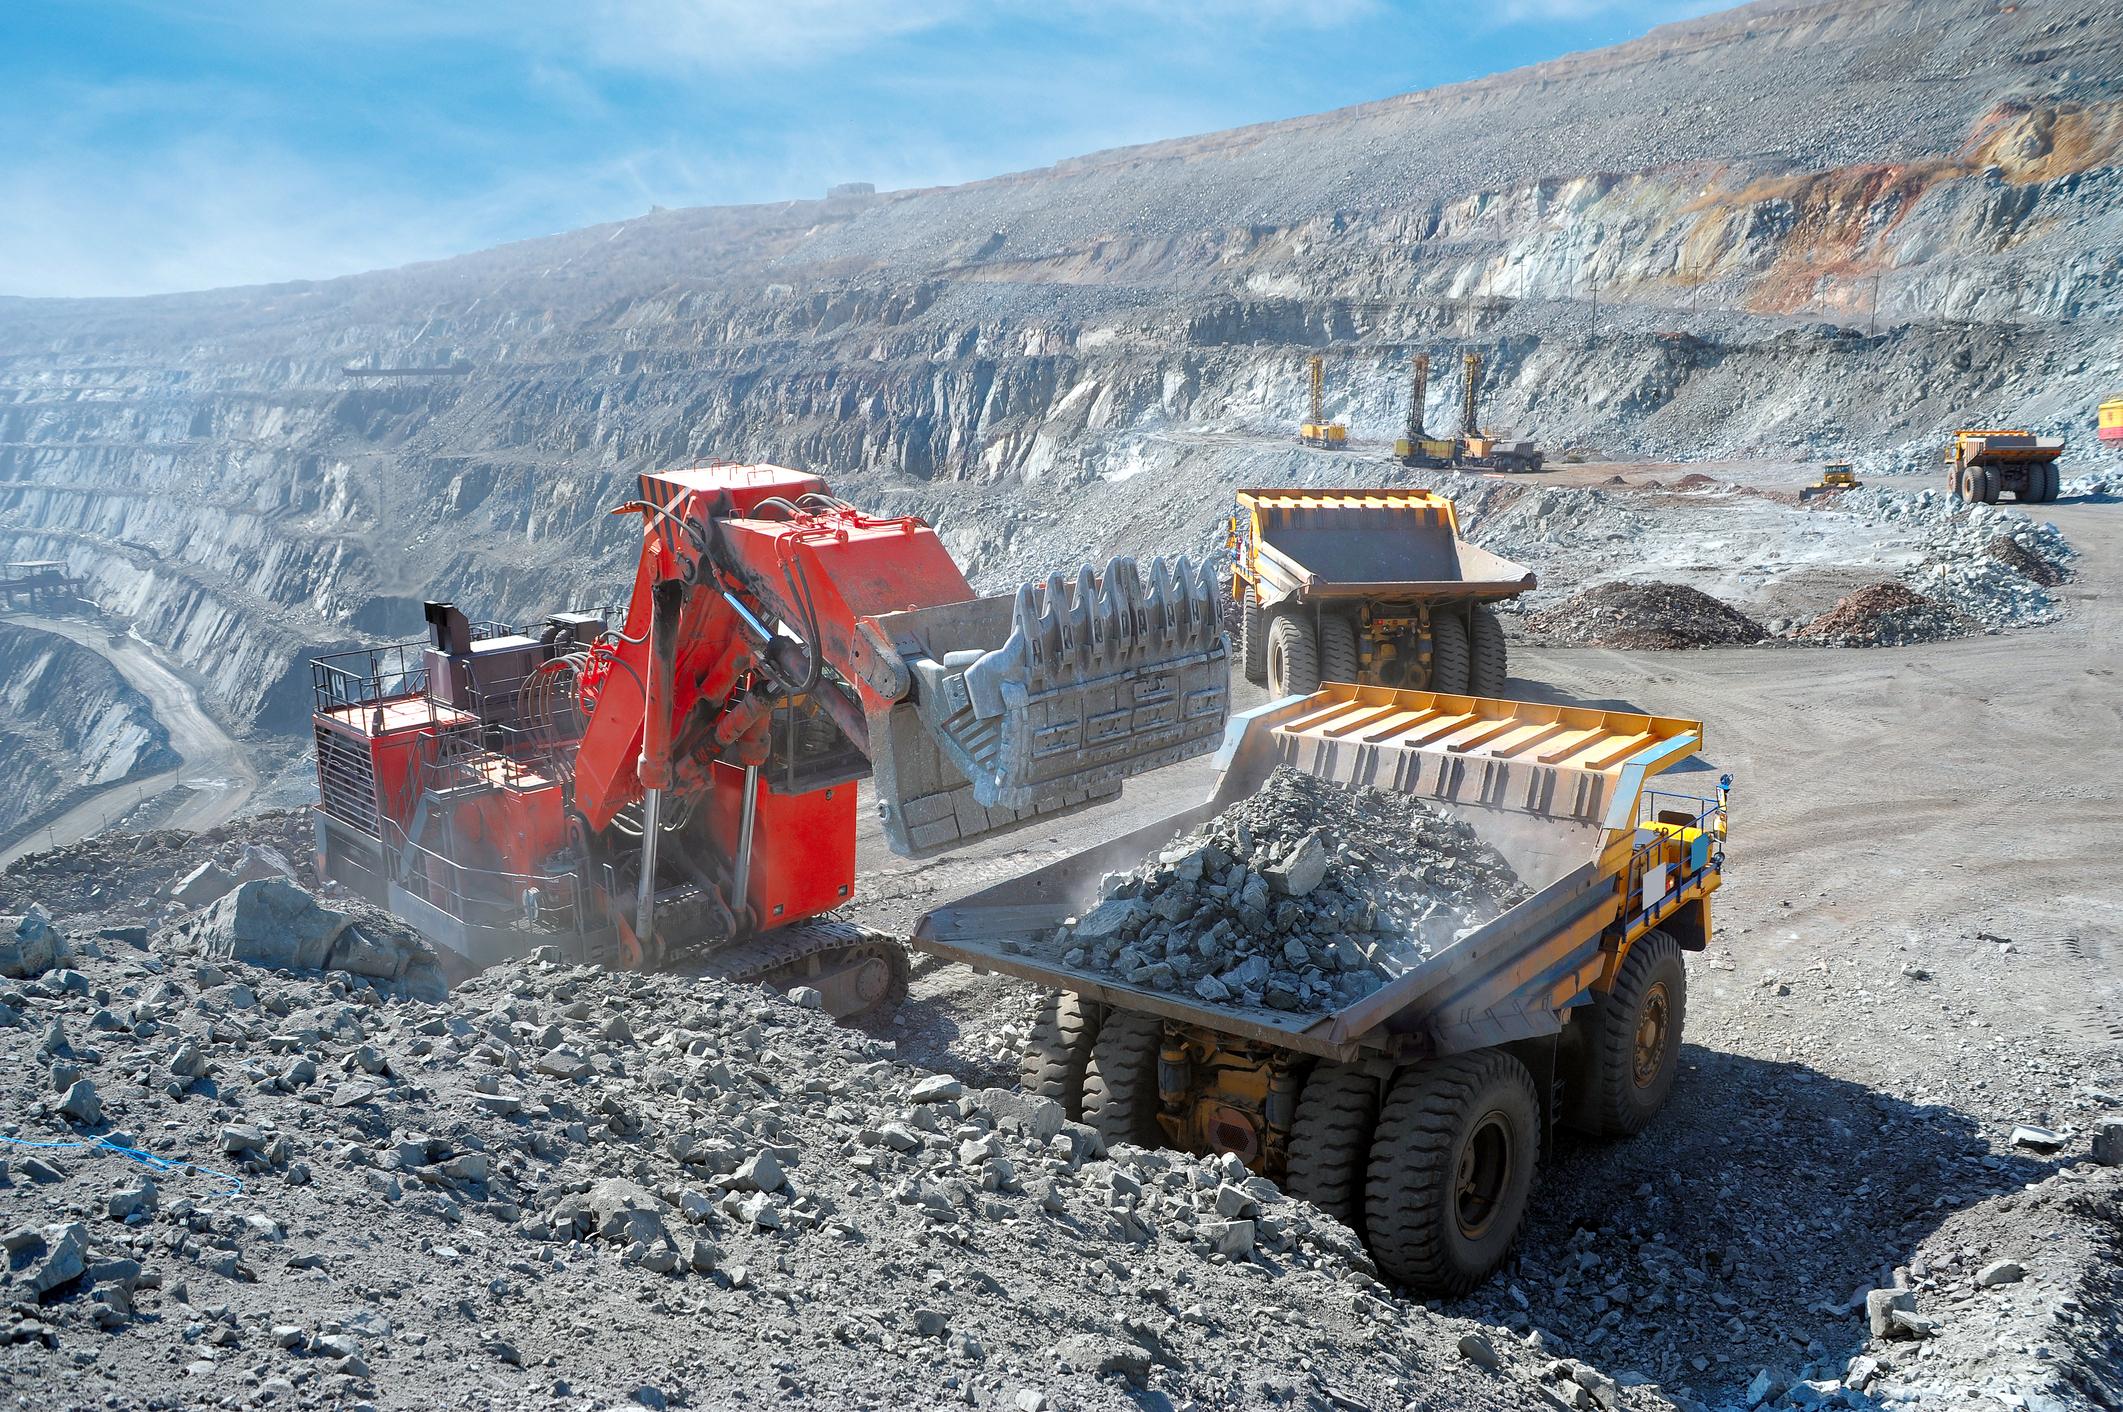 A mining excavator filling a dump truck.